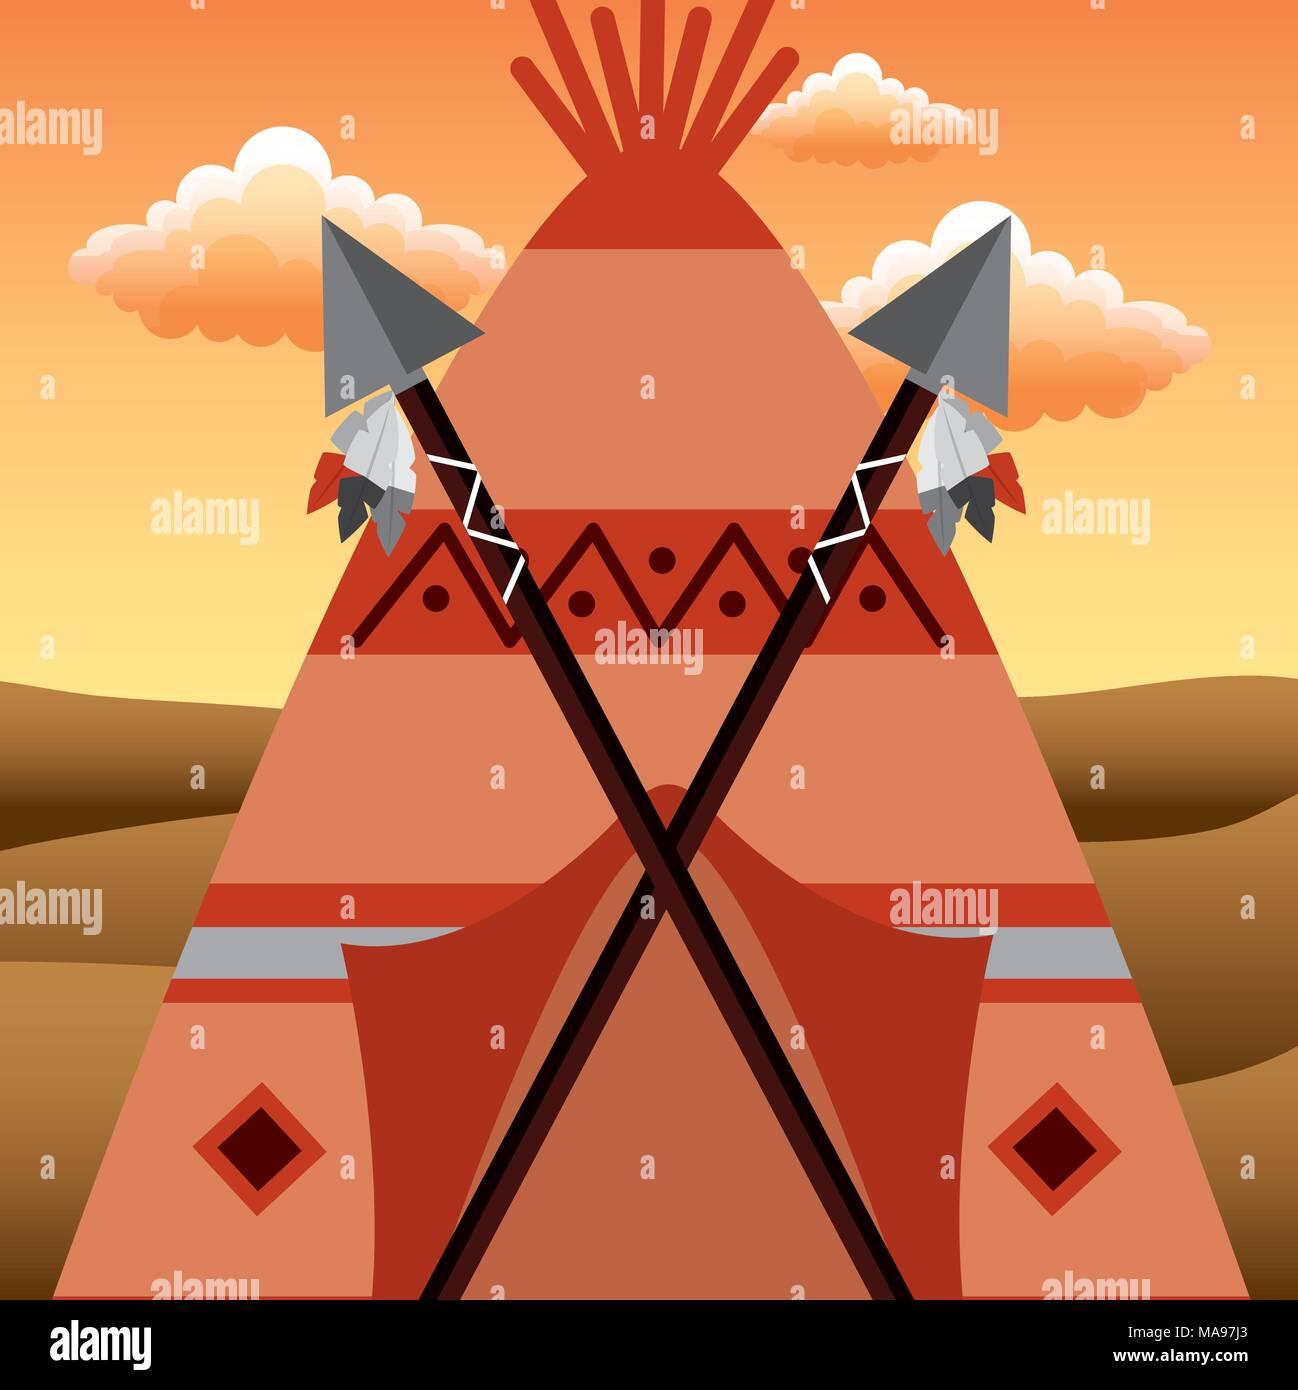 Tribal Design Stock Photos & Tribal Design Stock Images